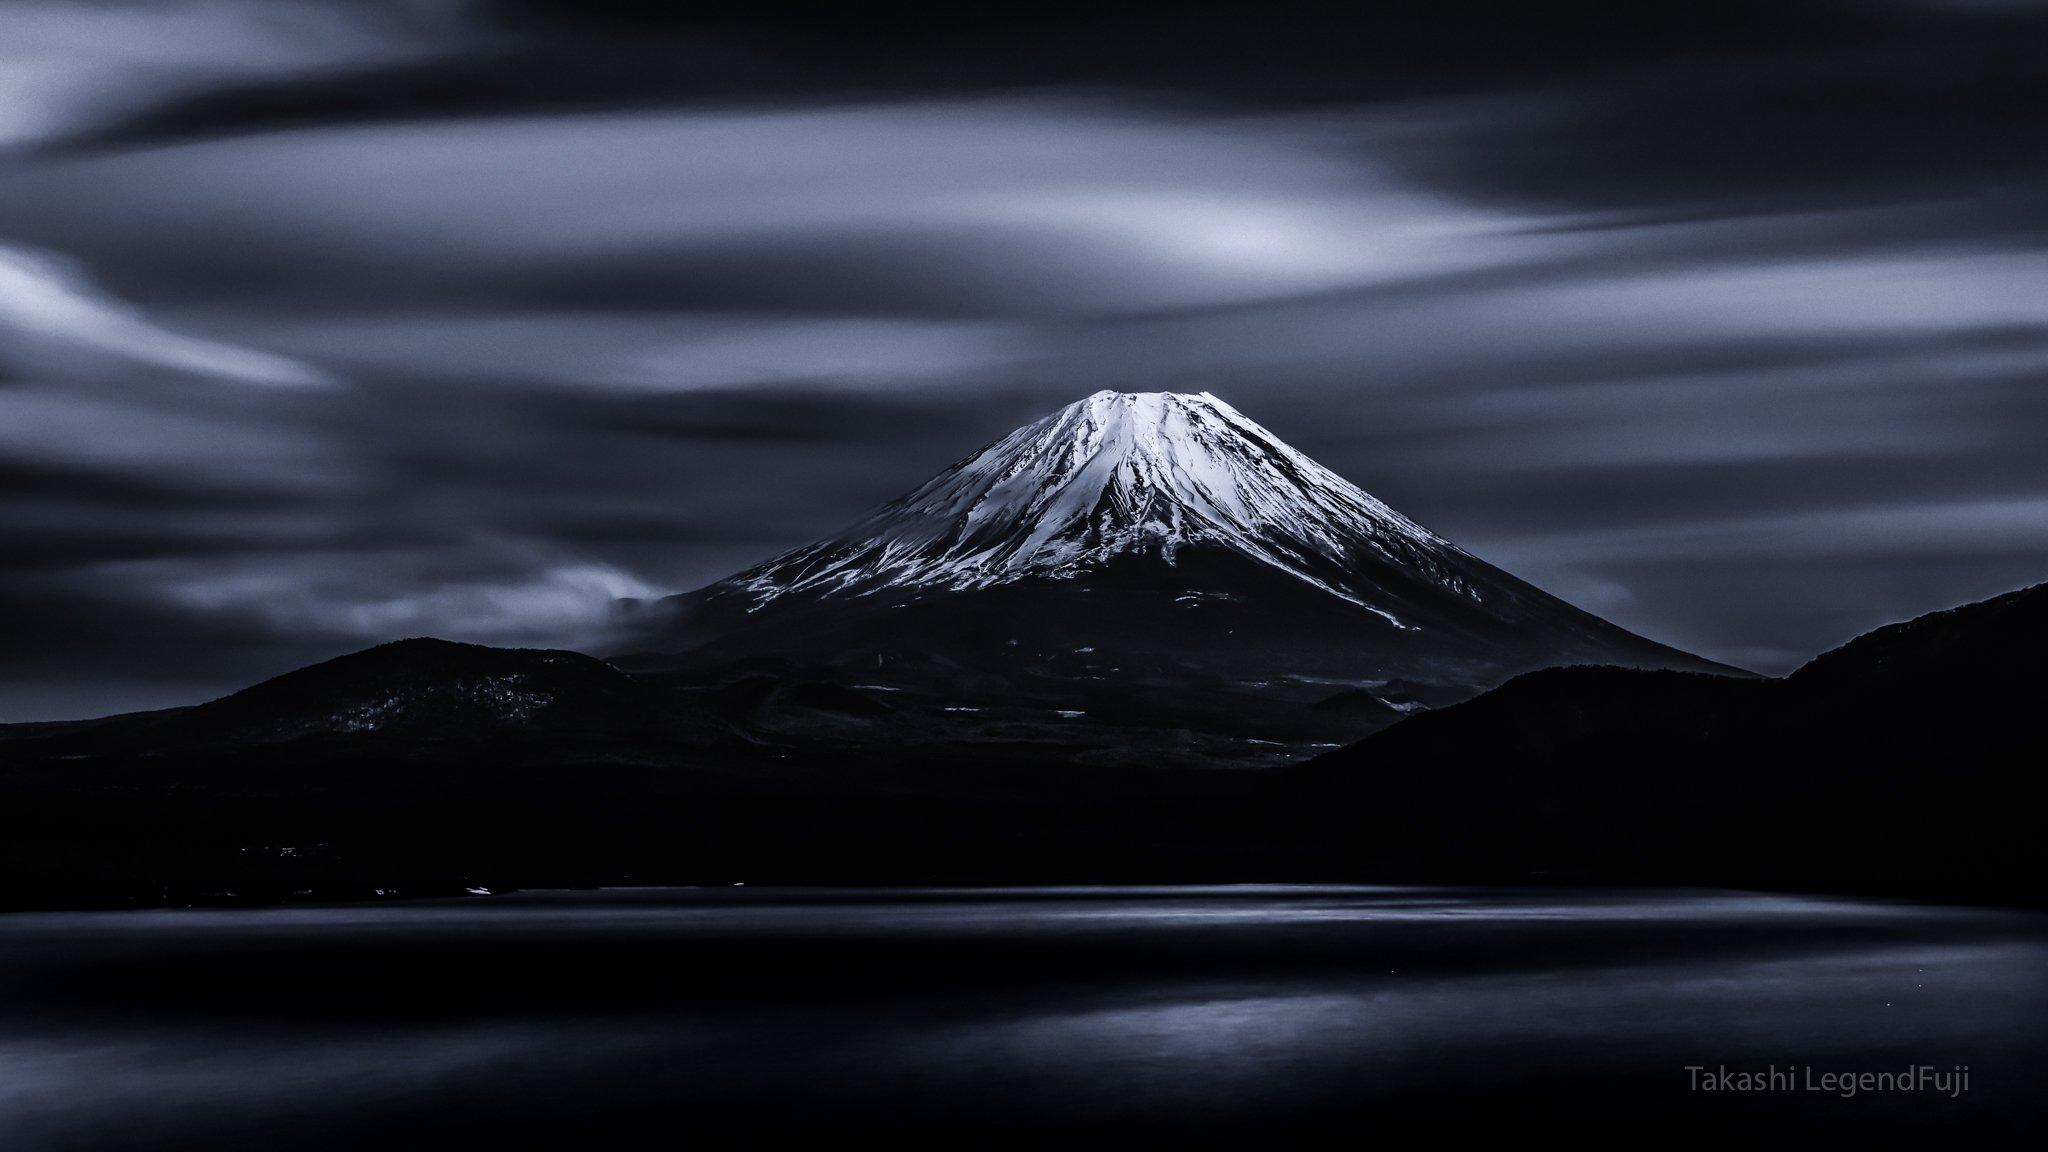 Fuji,mountain,Japan,cloud,lake,water,sky,snow,slow,flow,blue,beautiful,wonderful,amazing,, Takashi